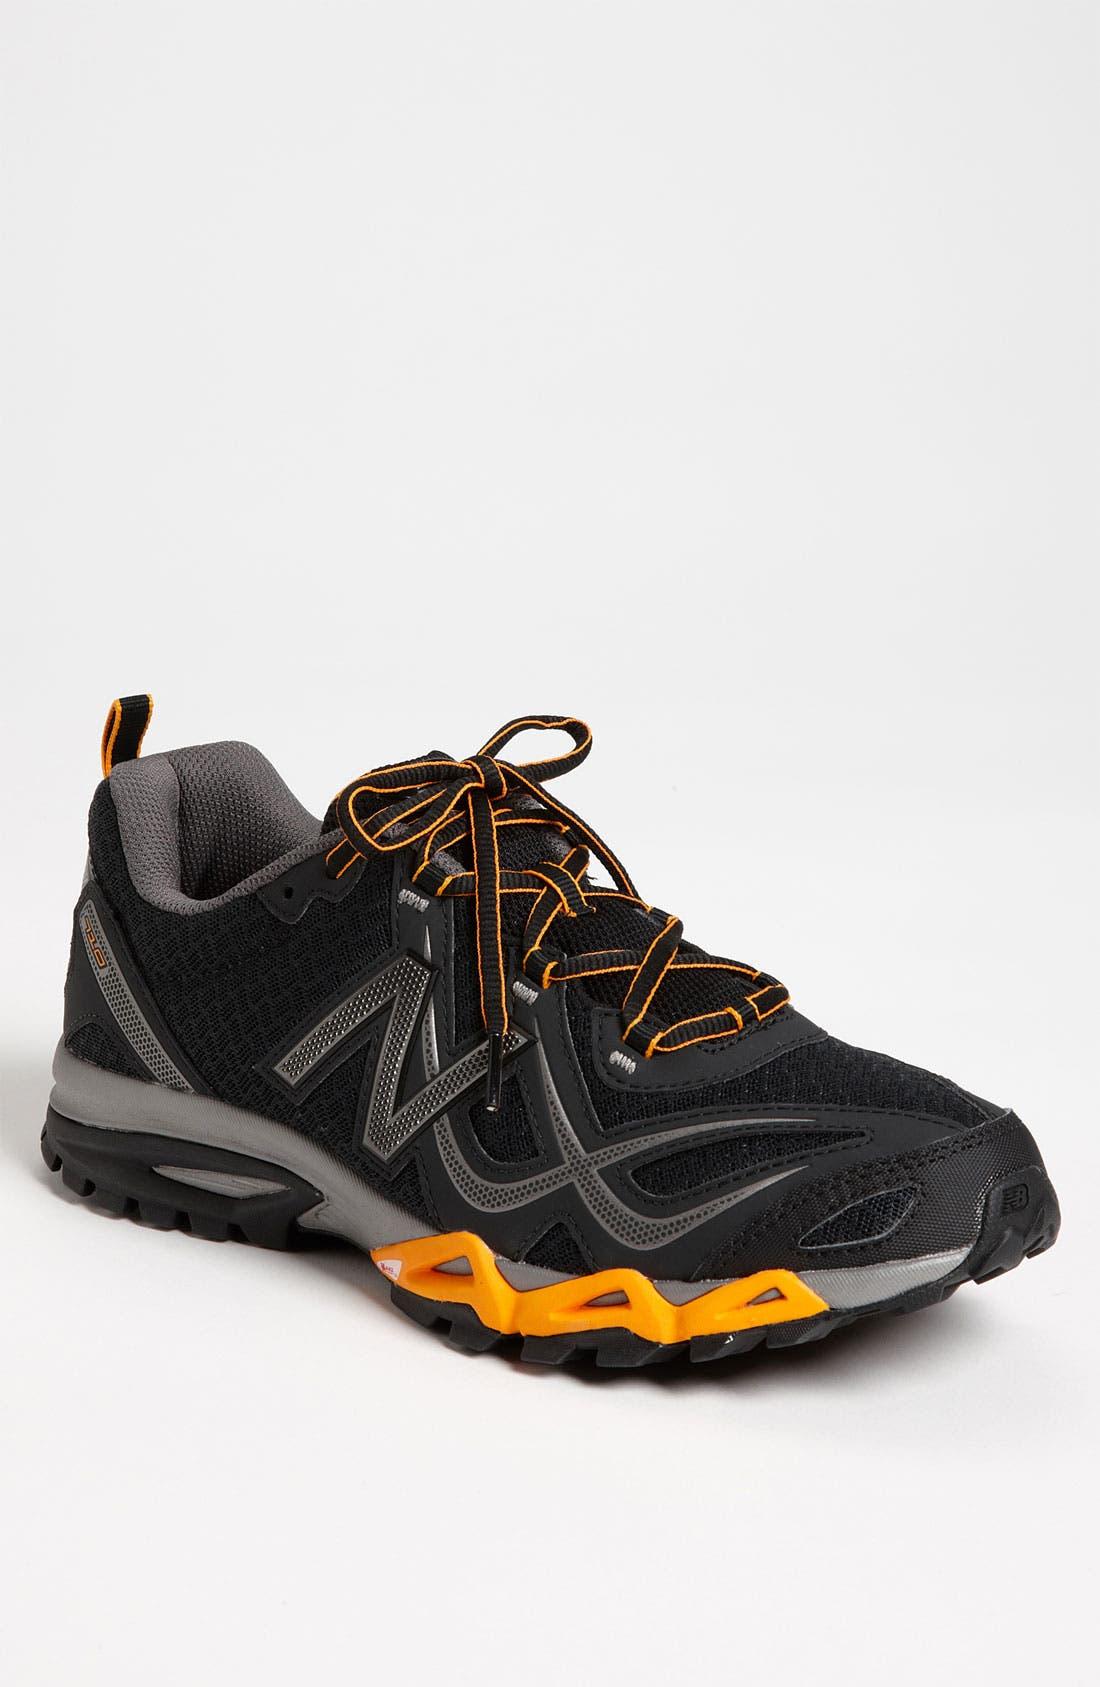 Alternate Image 1 Selected - New Balance '710' Trail Running Shoe (Men)